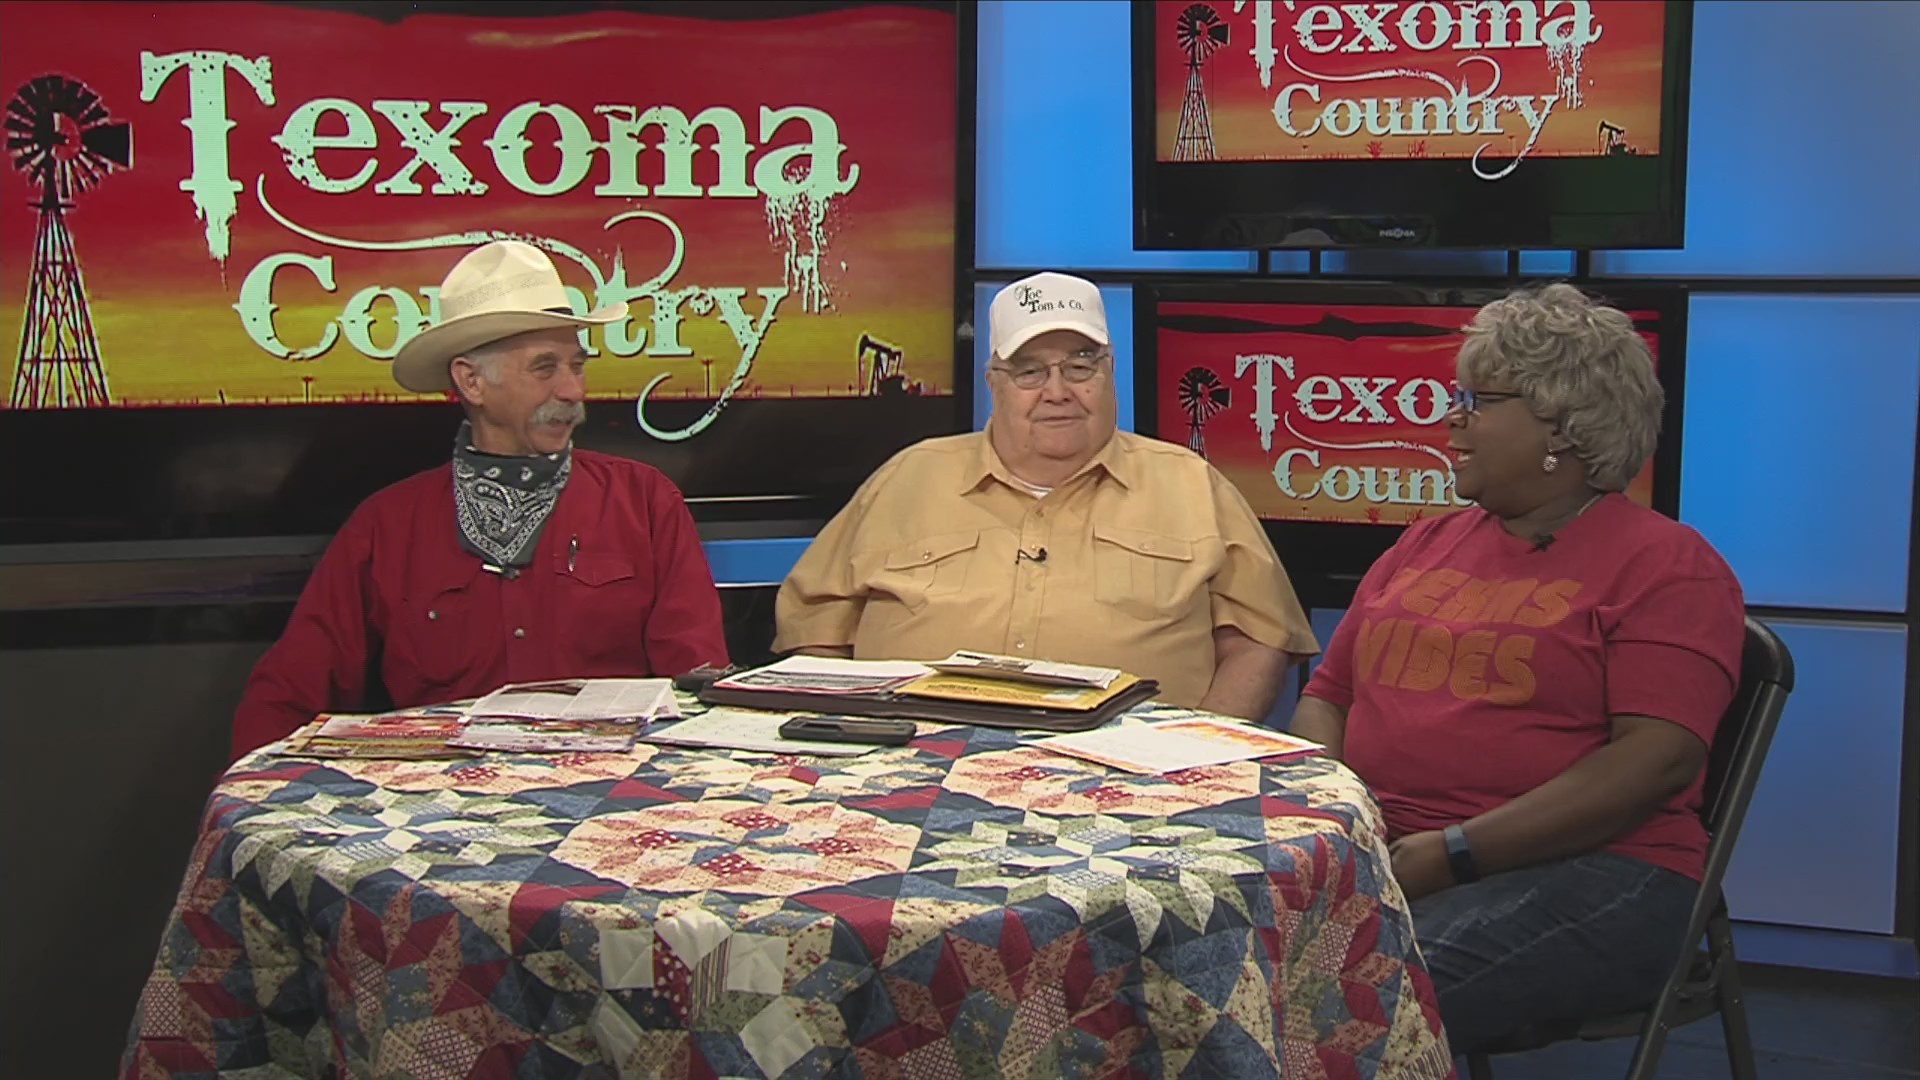 Texoma Country Morning 9/24/18 3